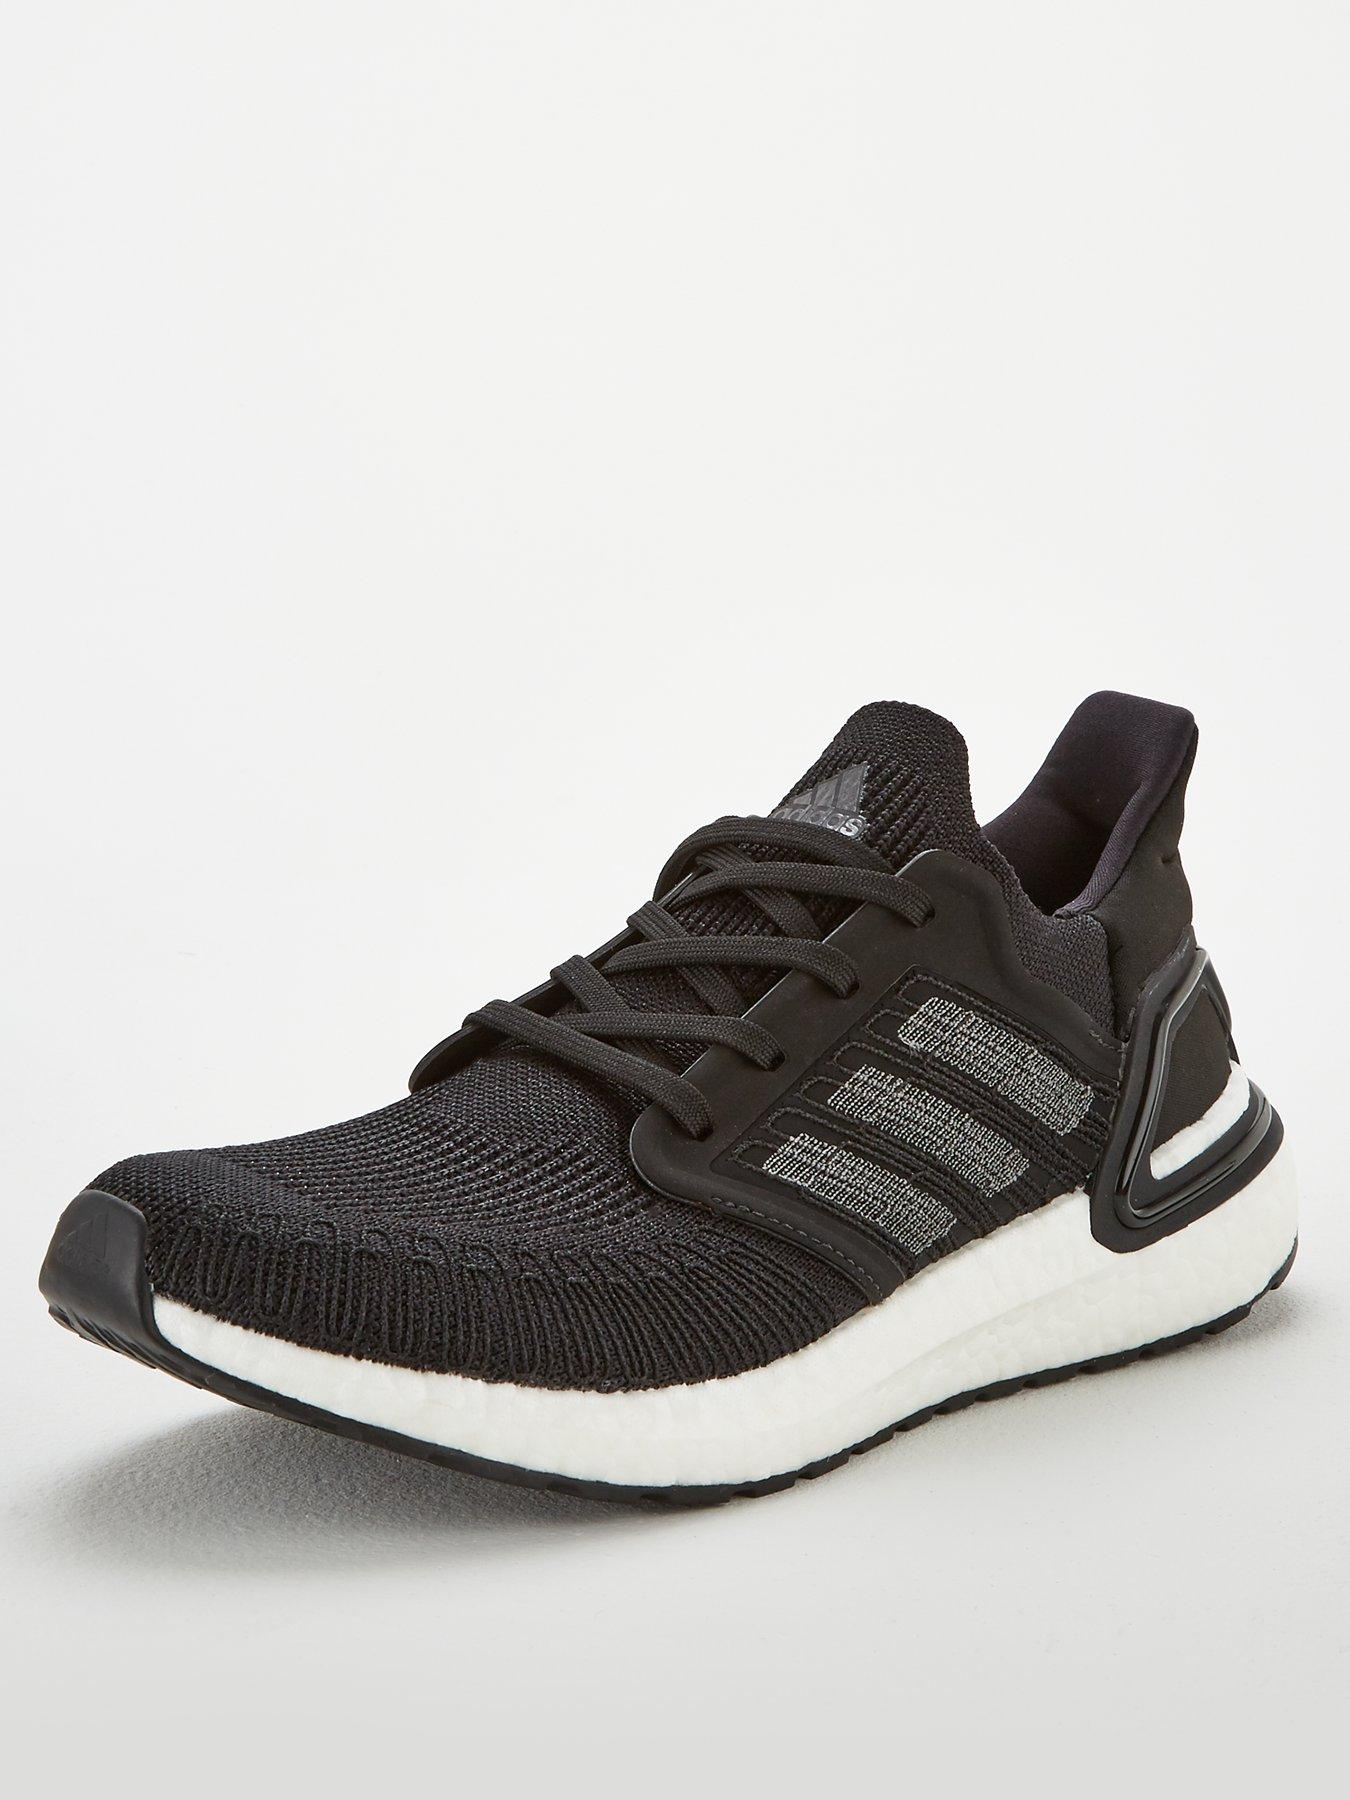 adidas ultra boost white uk